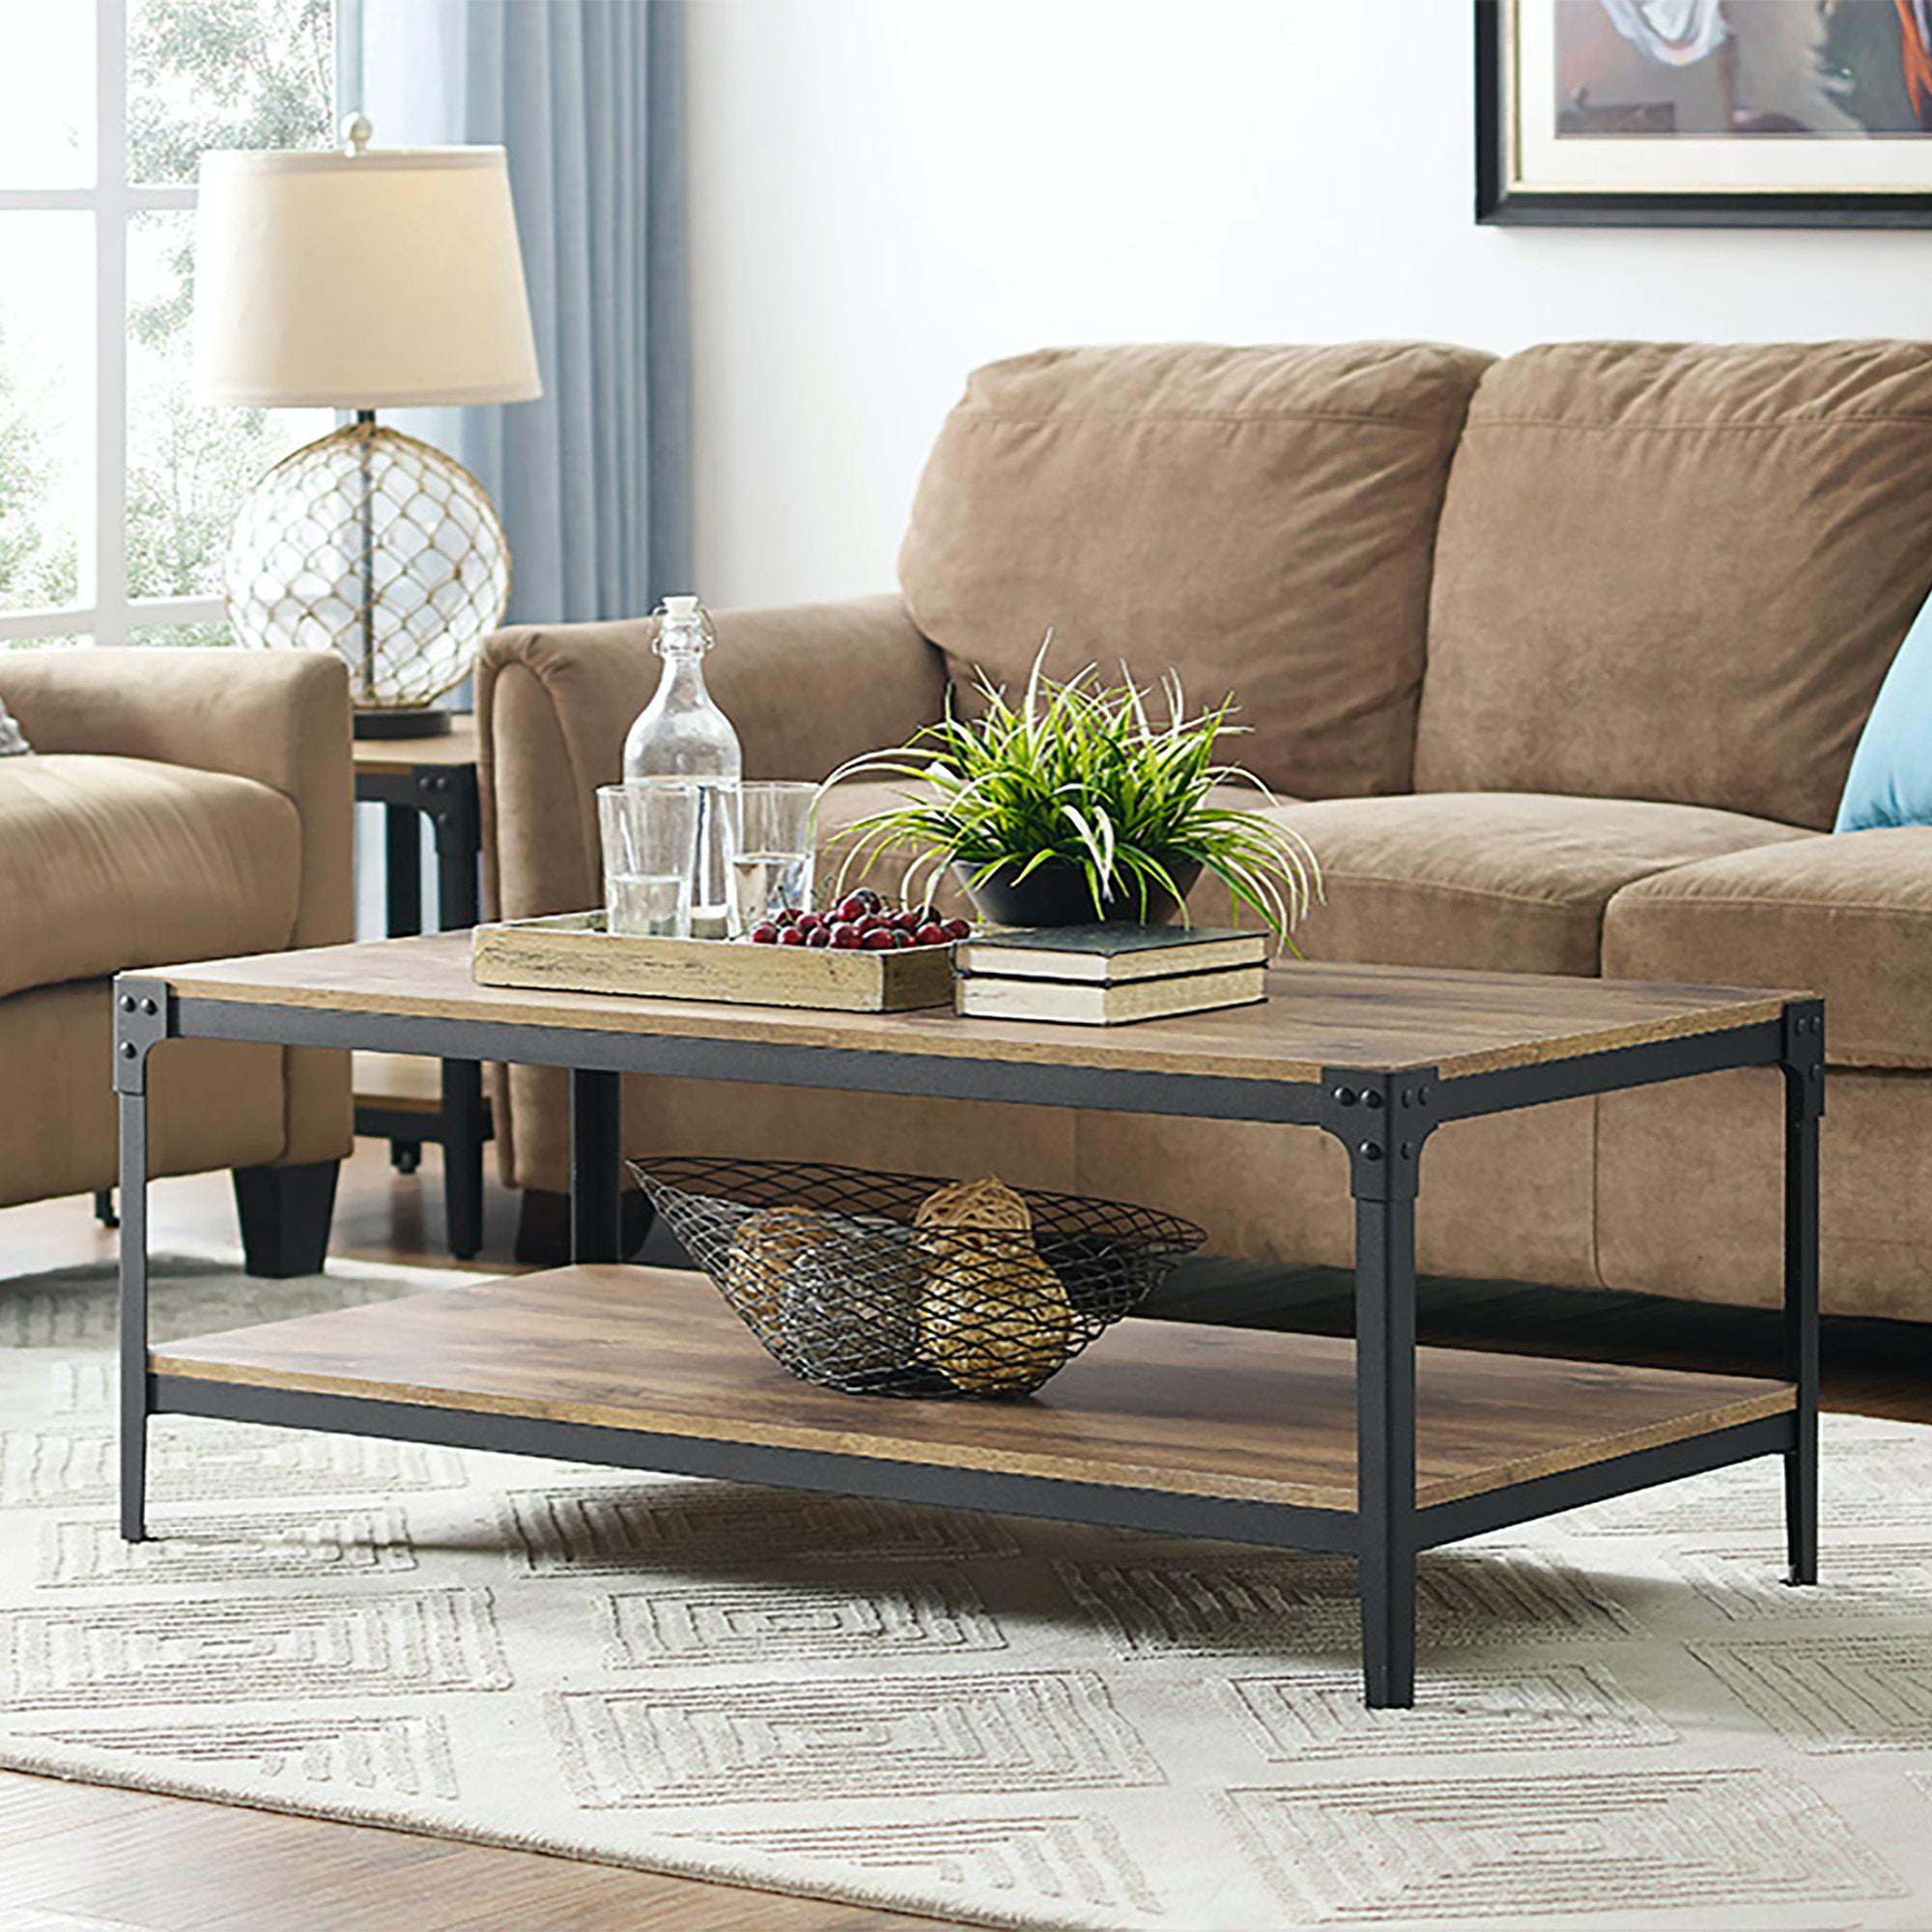 Ft Myers Living Room Angle Iron Rustic Wood Coffee Table - Barnwood  WEDC46AICTBW Walter E. Smithe Furniture + Design